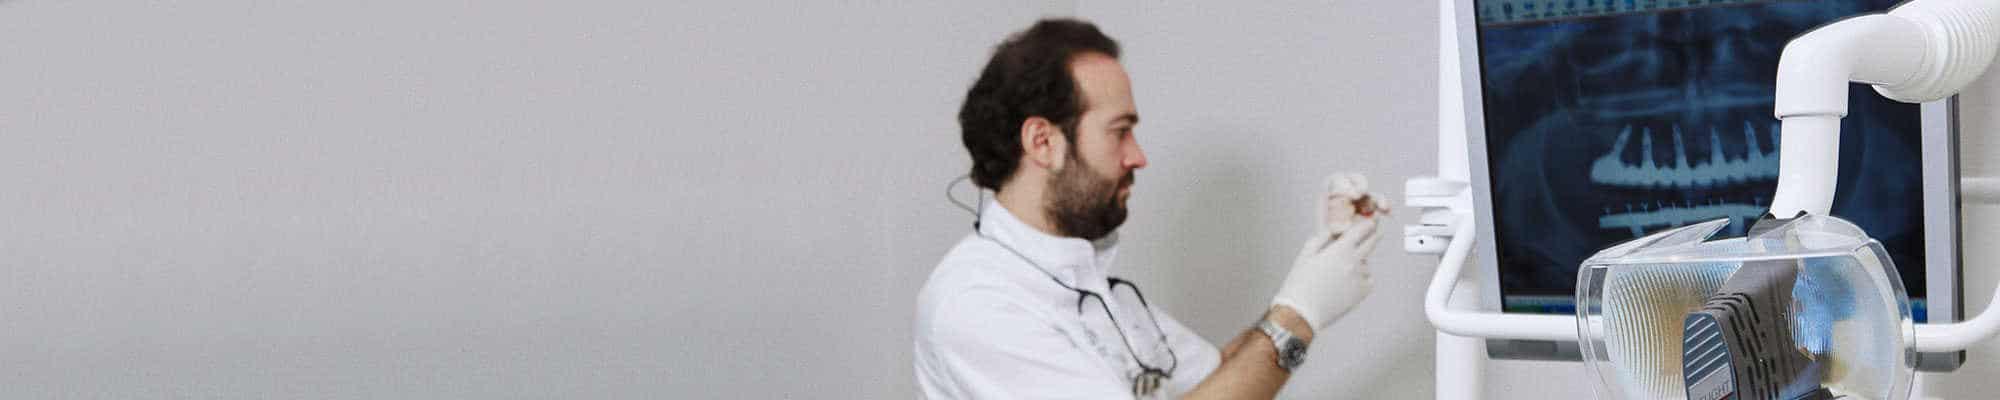 Especialidades odontológicas | Julián Saiz Clínica Dental